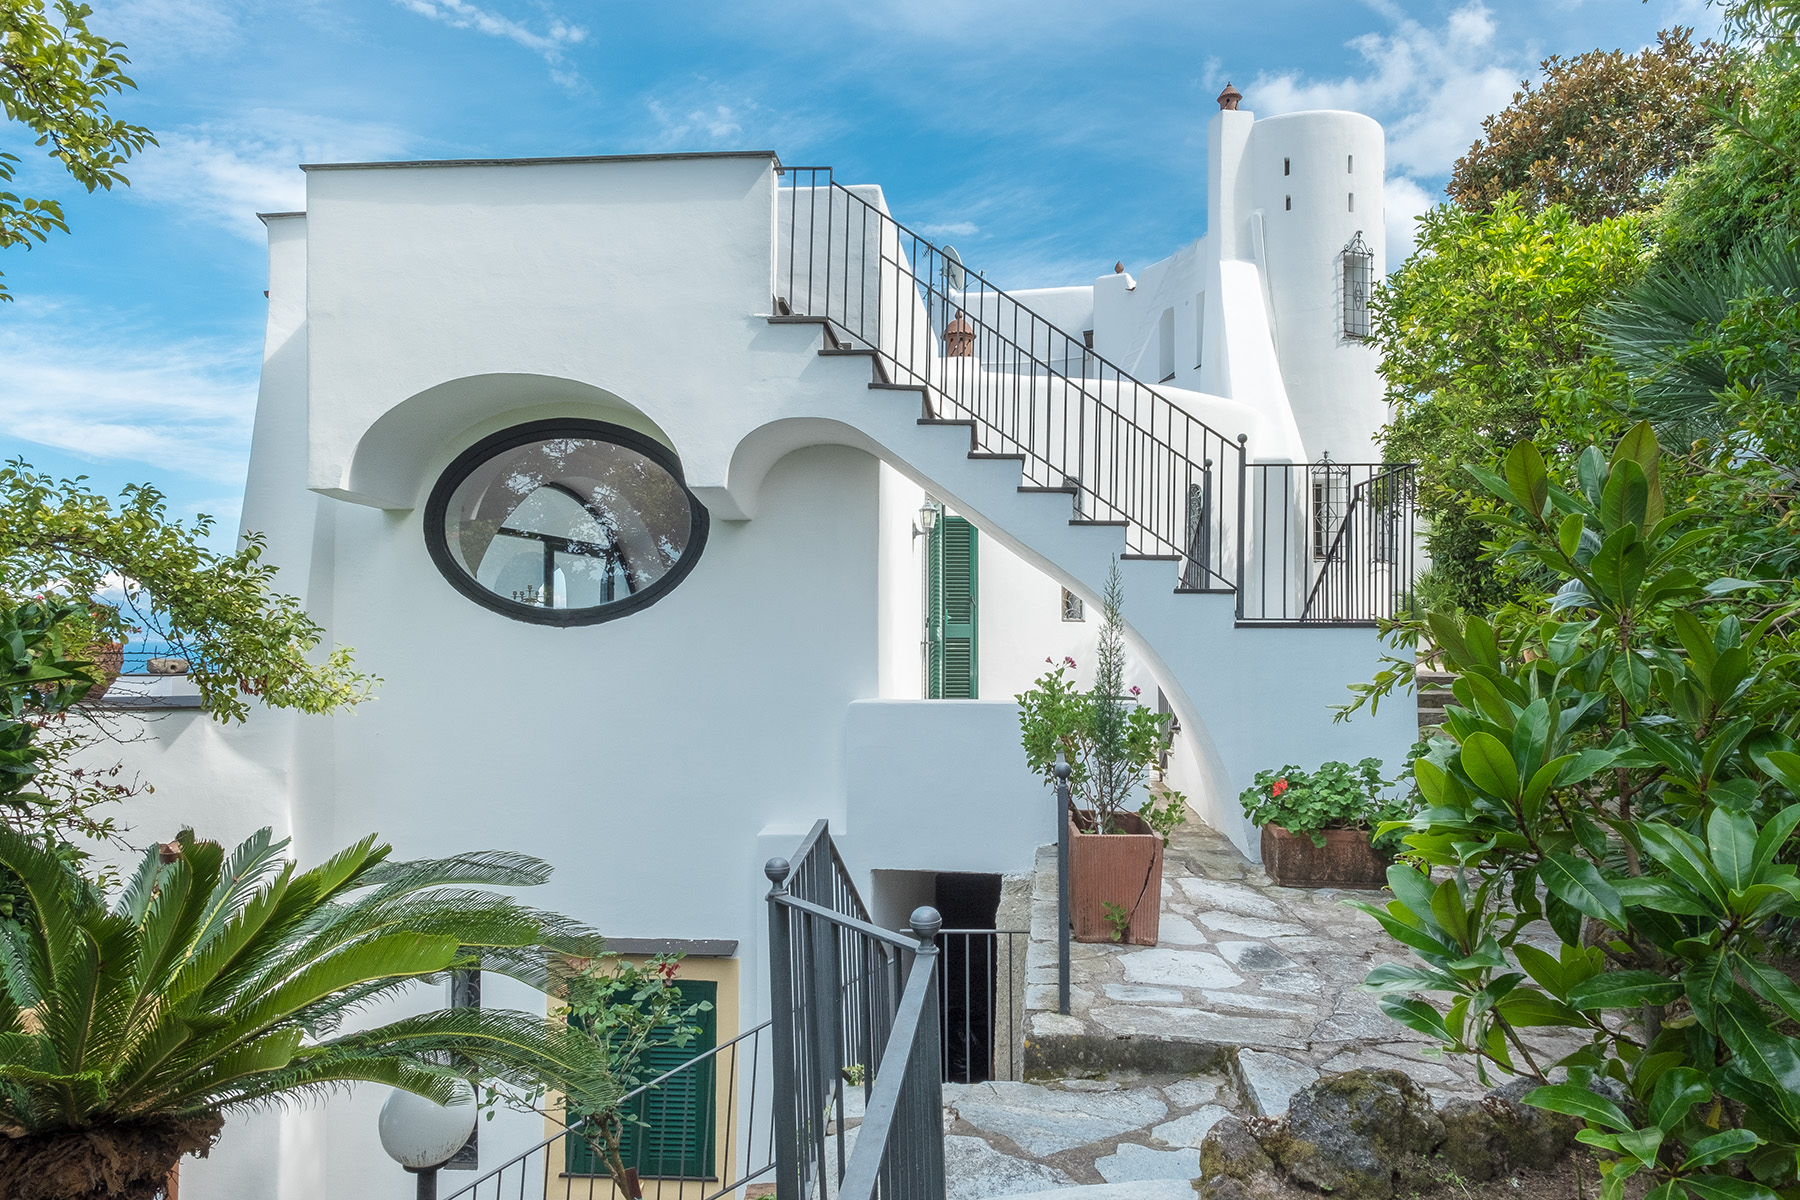 Villa in Vendita a Ischia: 5 locali, 500 mq - Foto 2